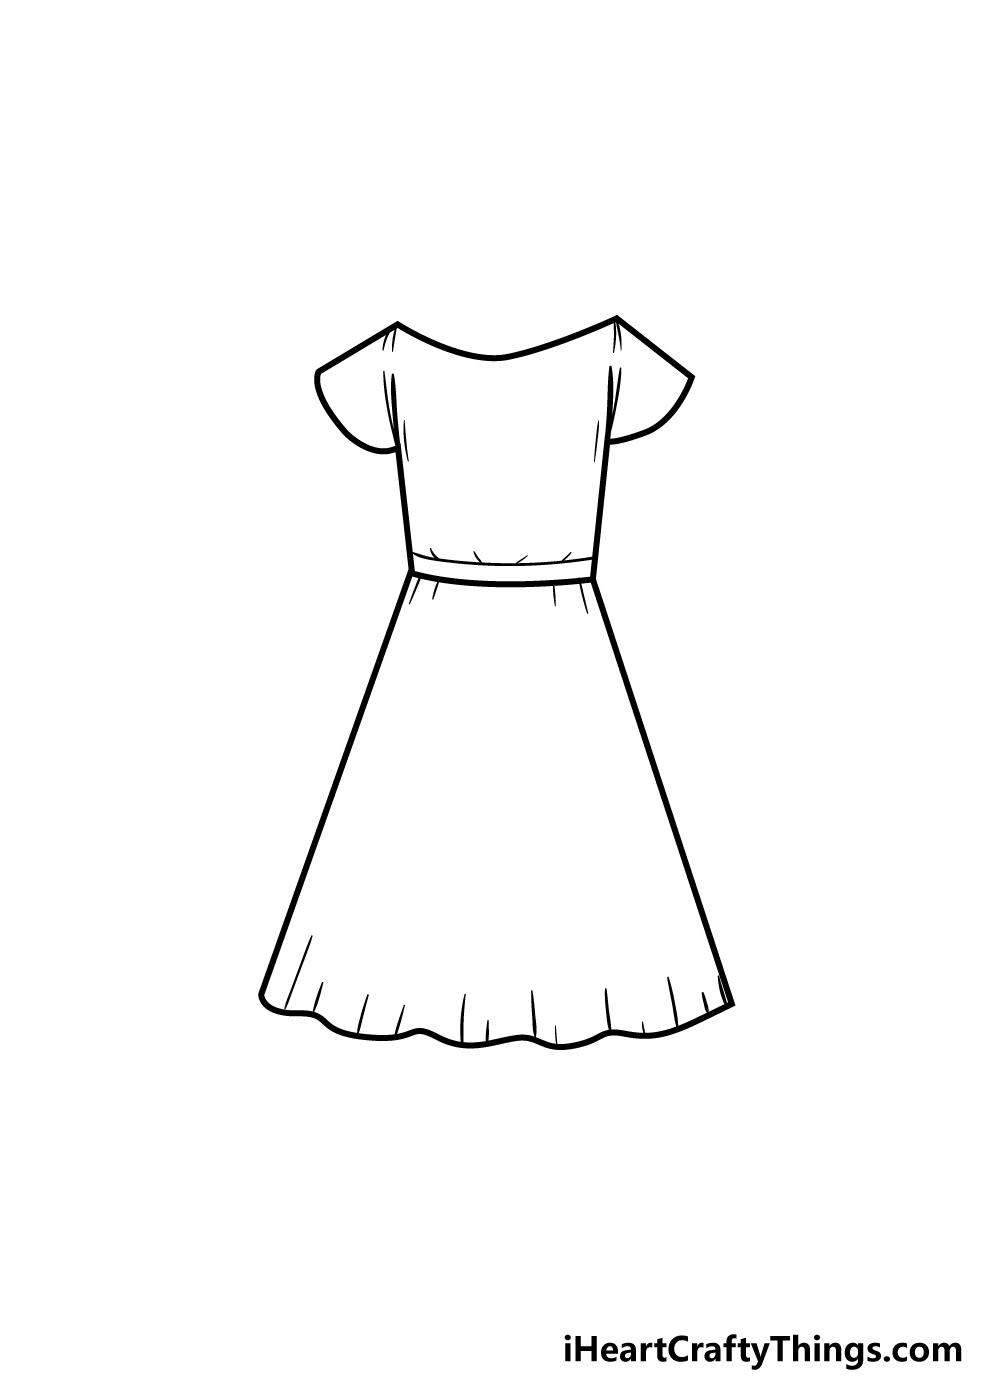 dress drawing step 6